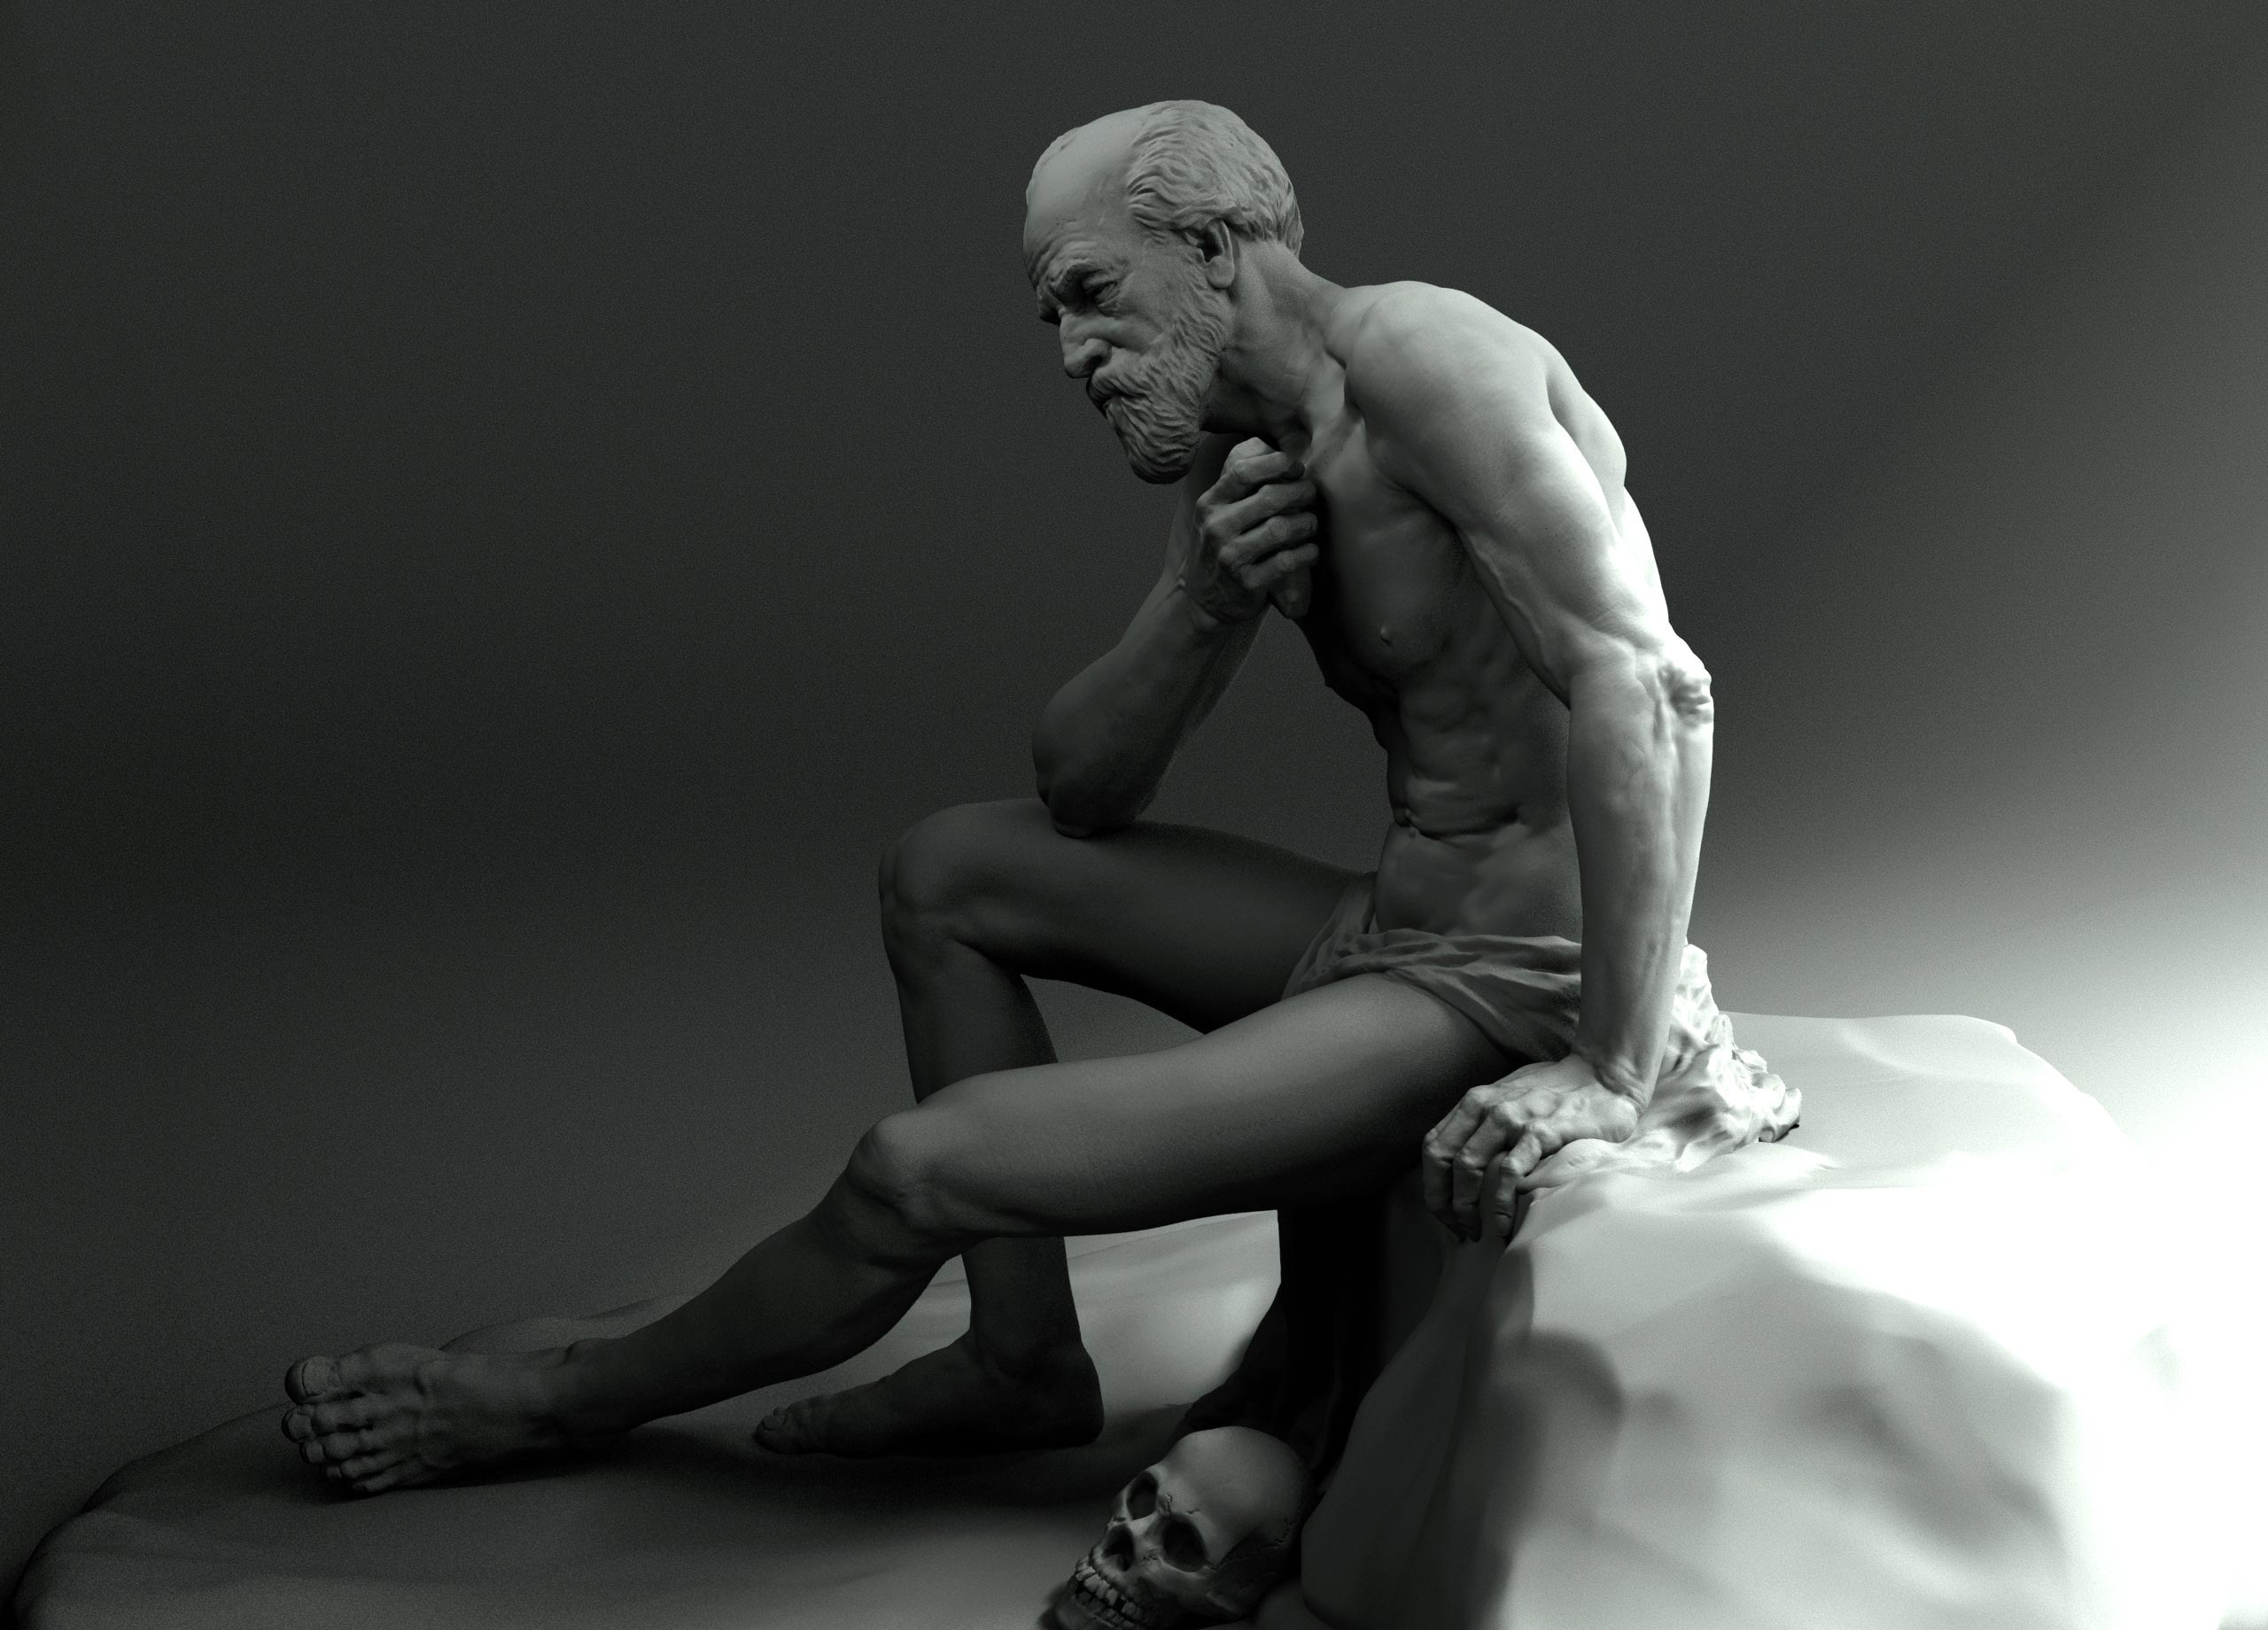 dating eldre menn anatomi